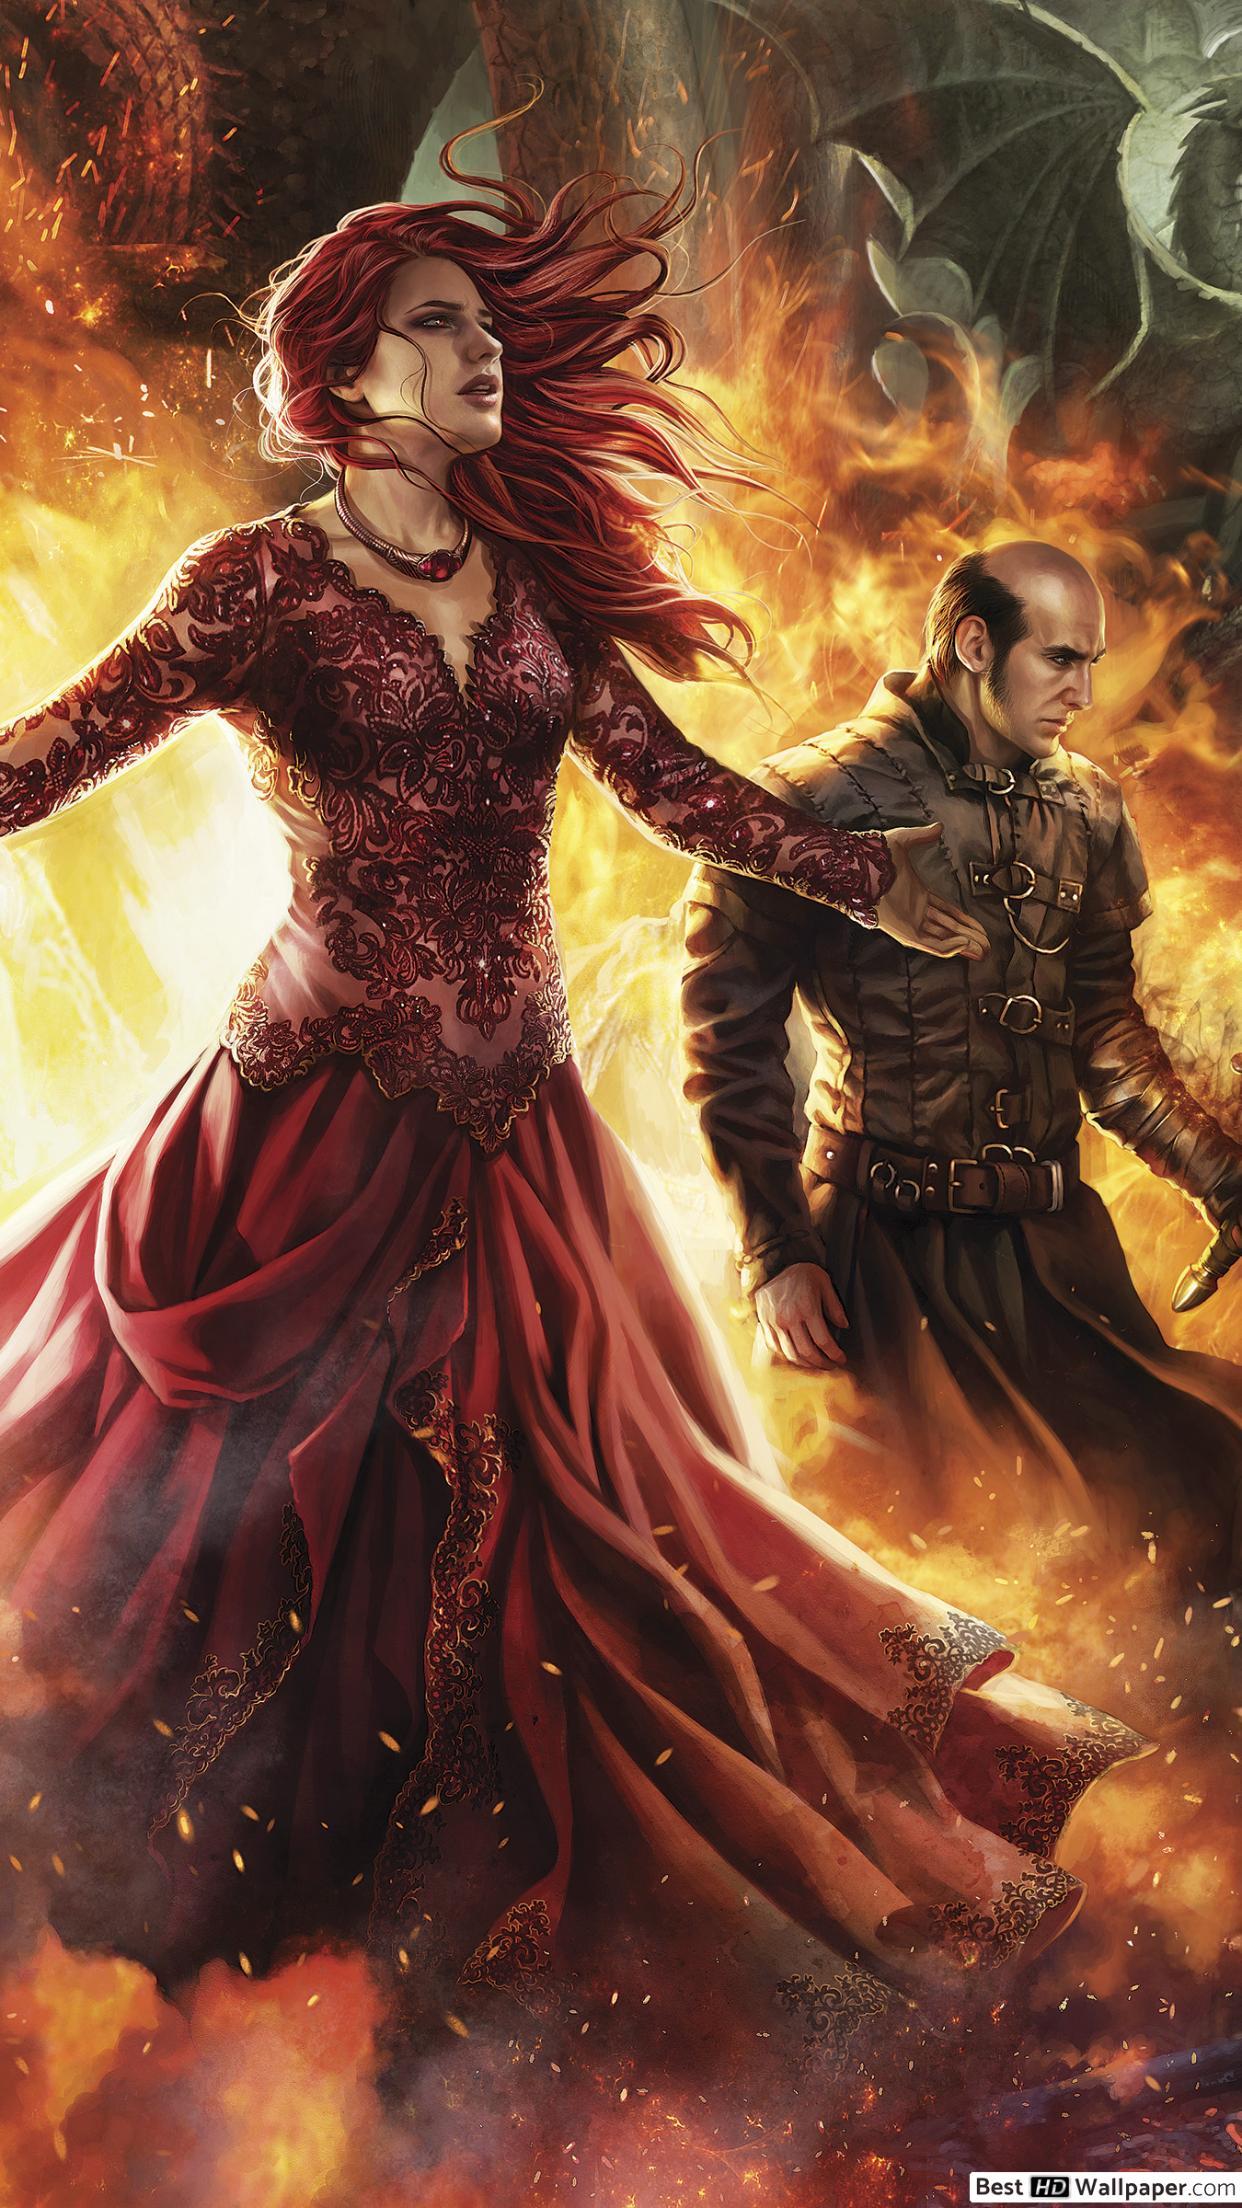 Game Of Thrones Calendar Art - HD Wallpaper